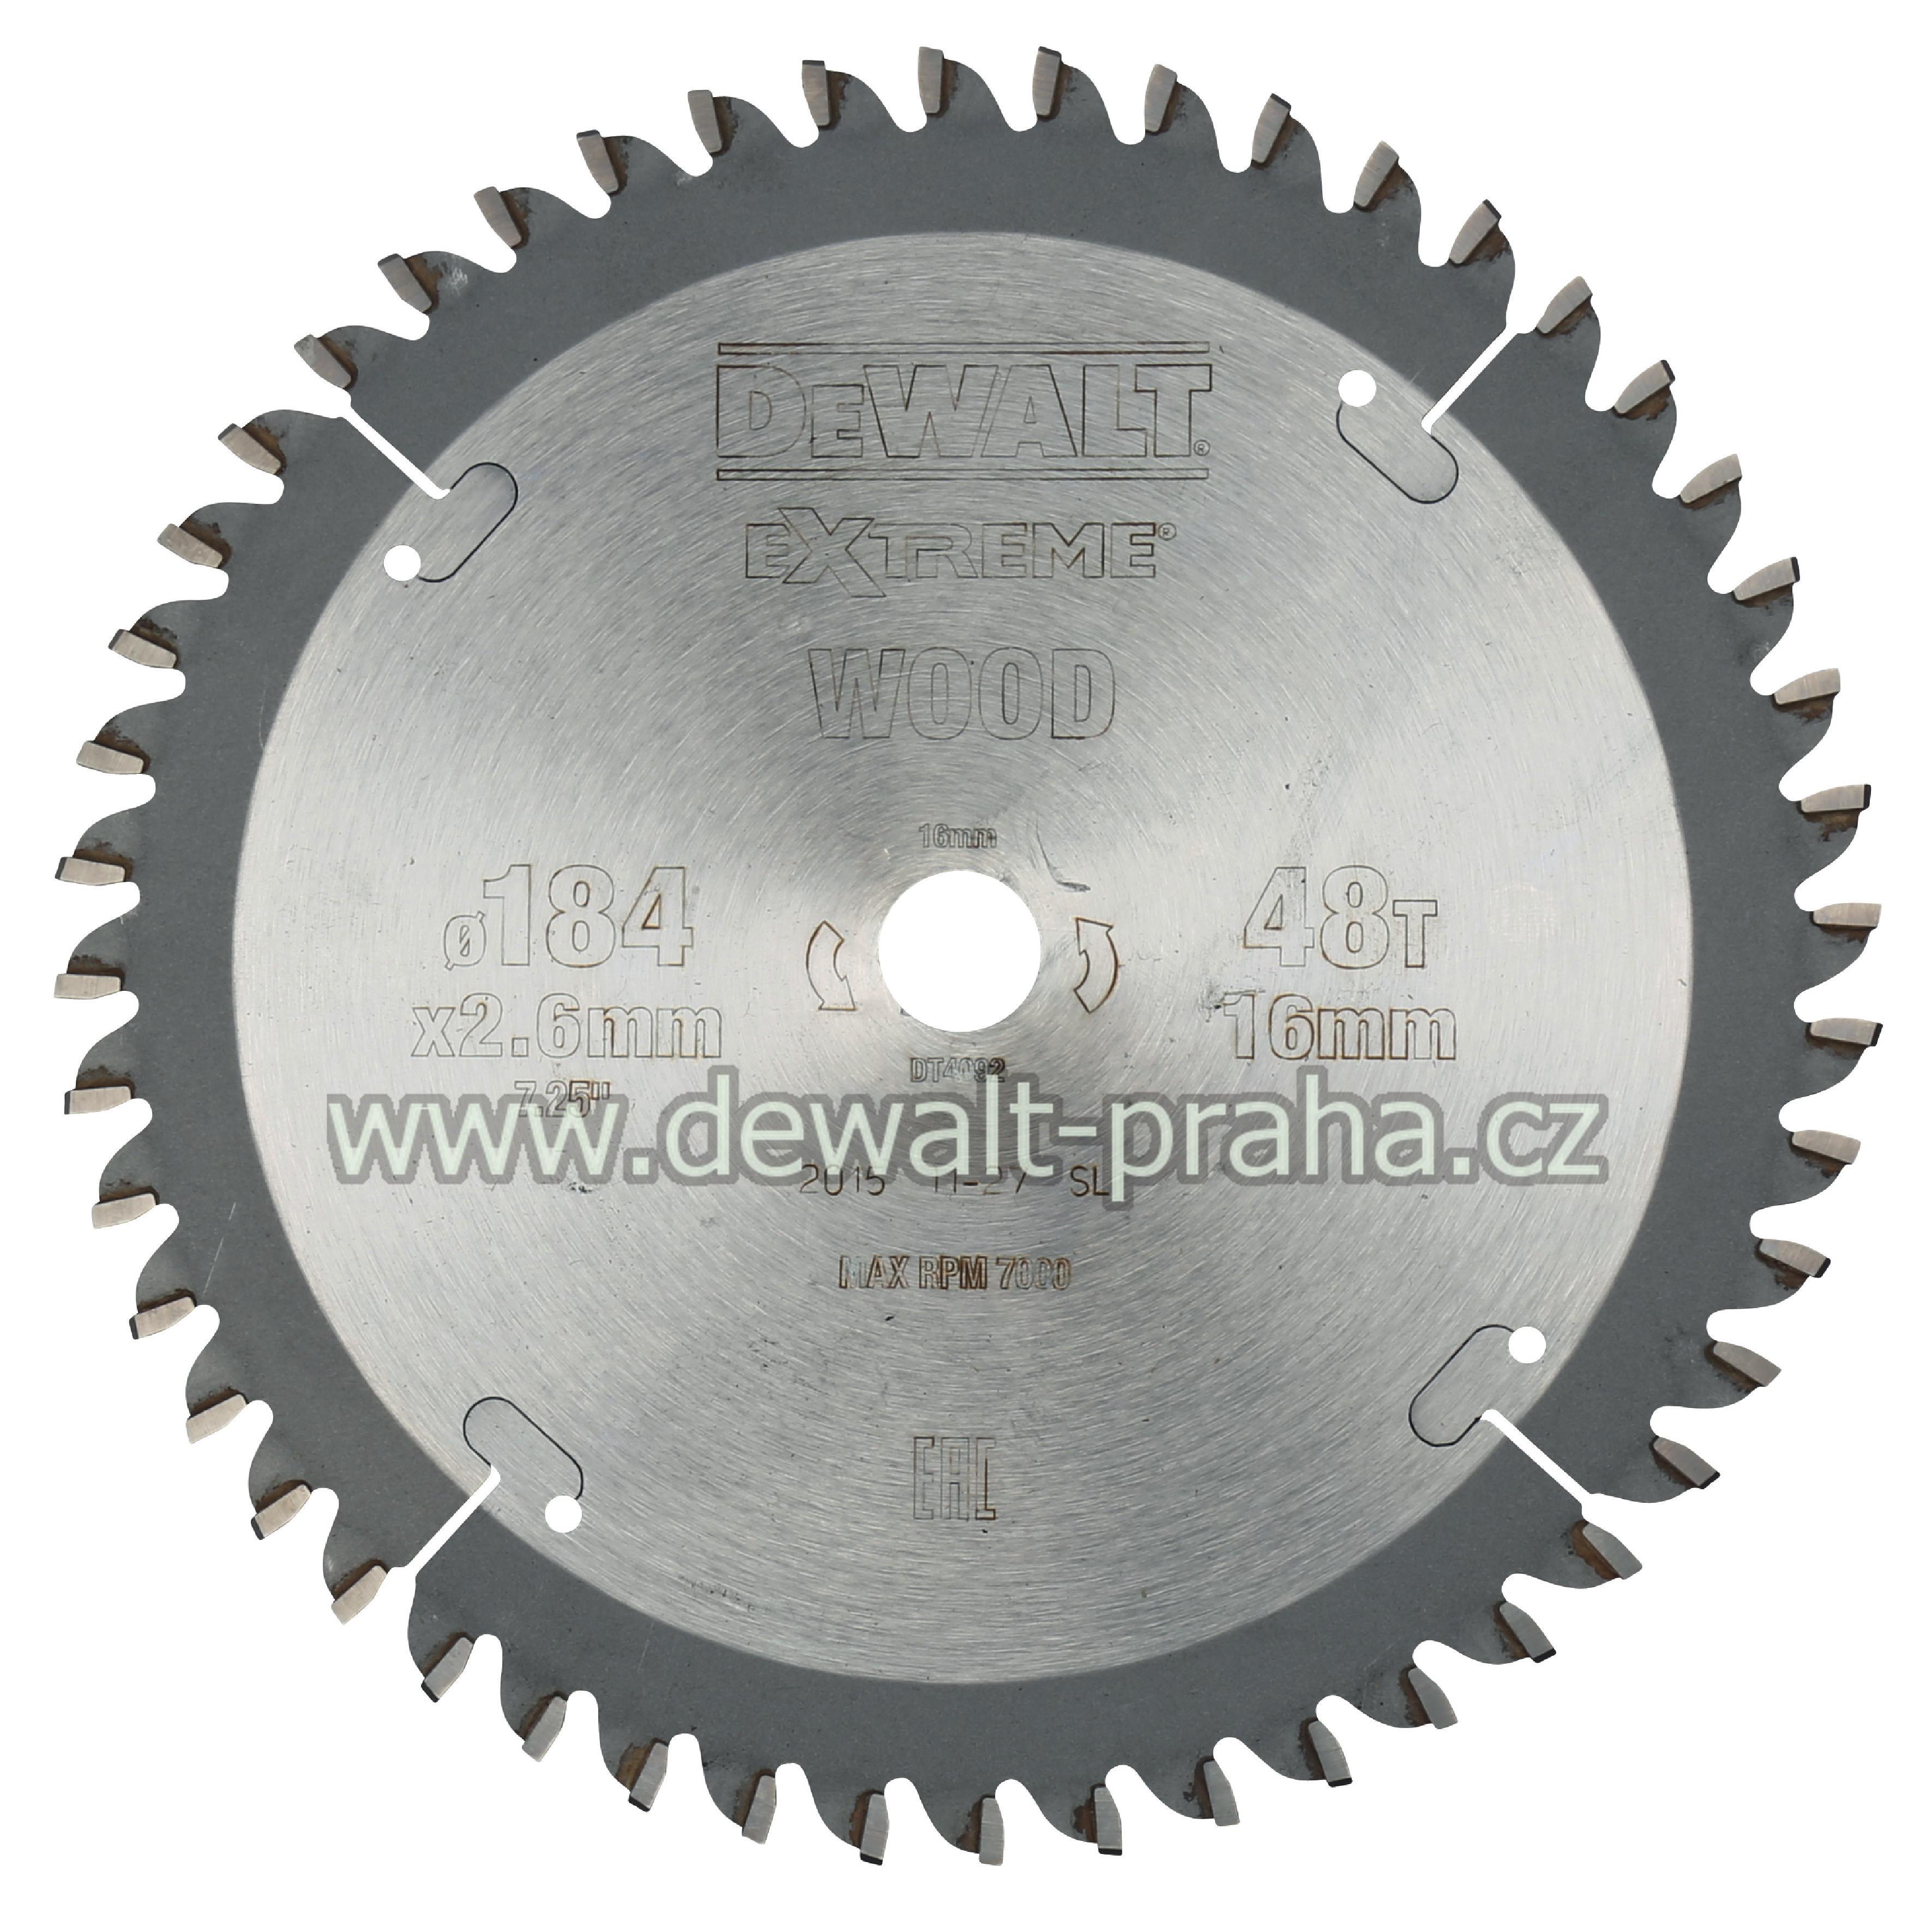 DT4092 DeWALT Pilový kotouč 184 x 16 mm, 48 zubů